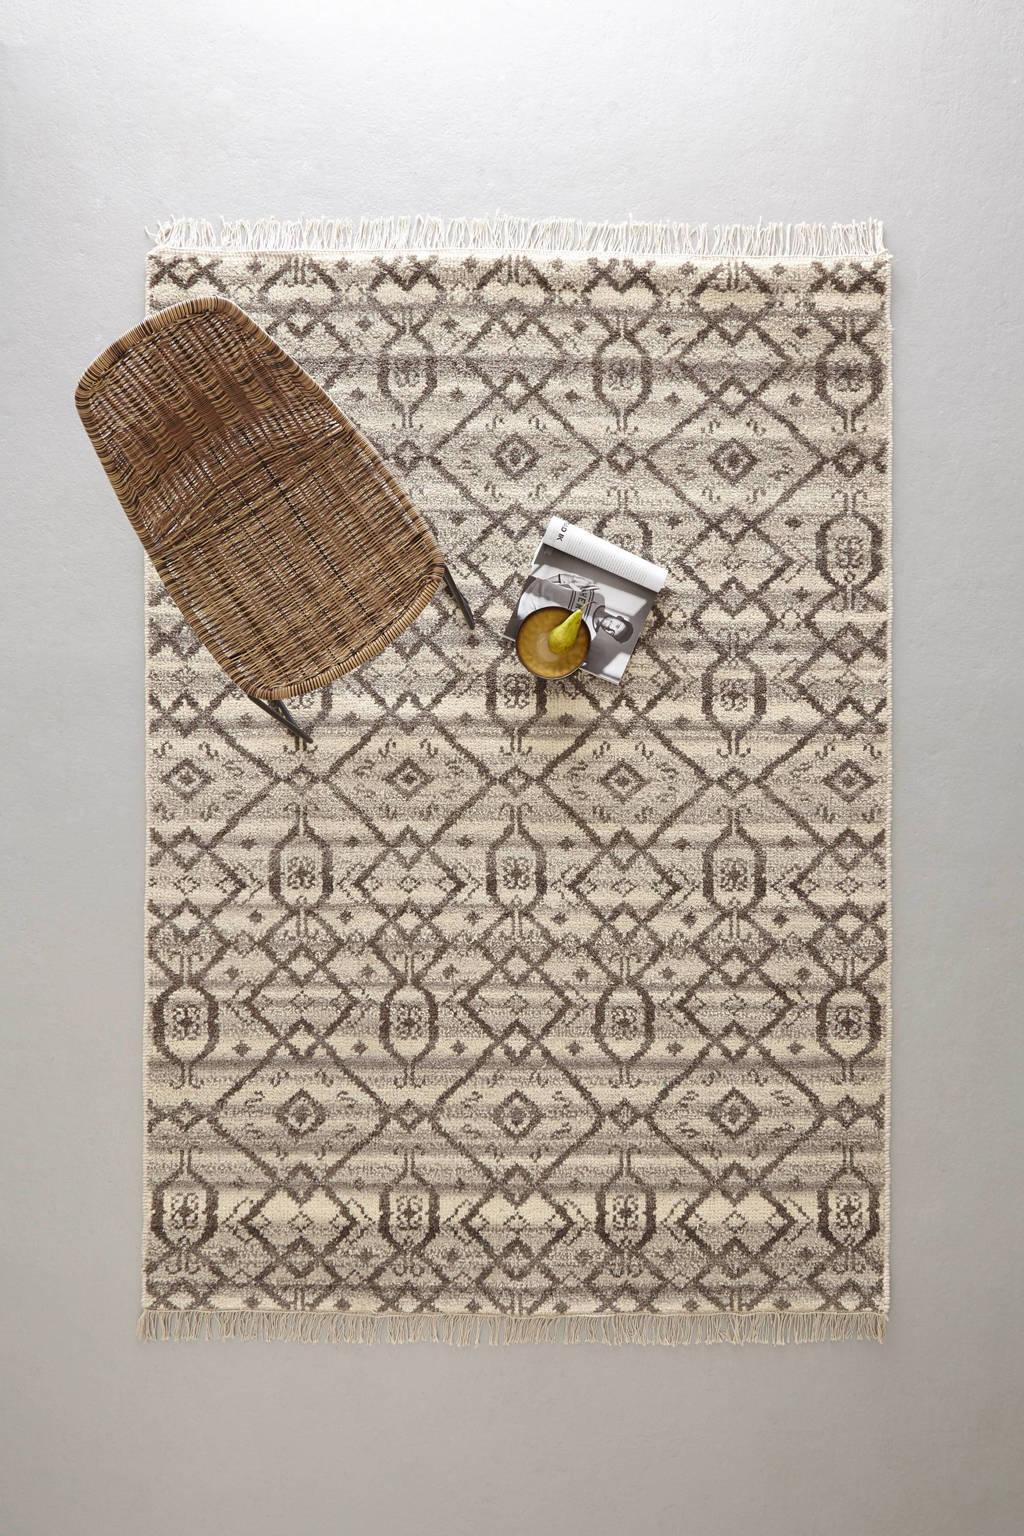 whkmp's own vloerkleed (wol)  (230x160 cm), Ecru/bruin